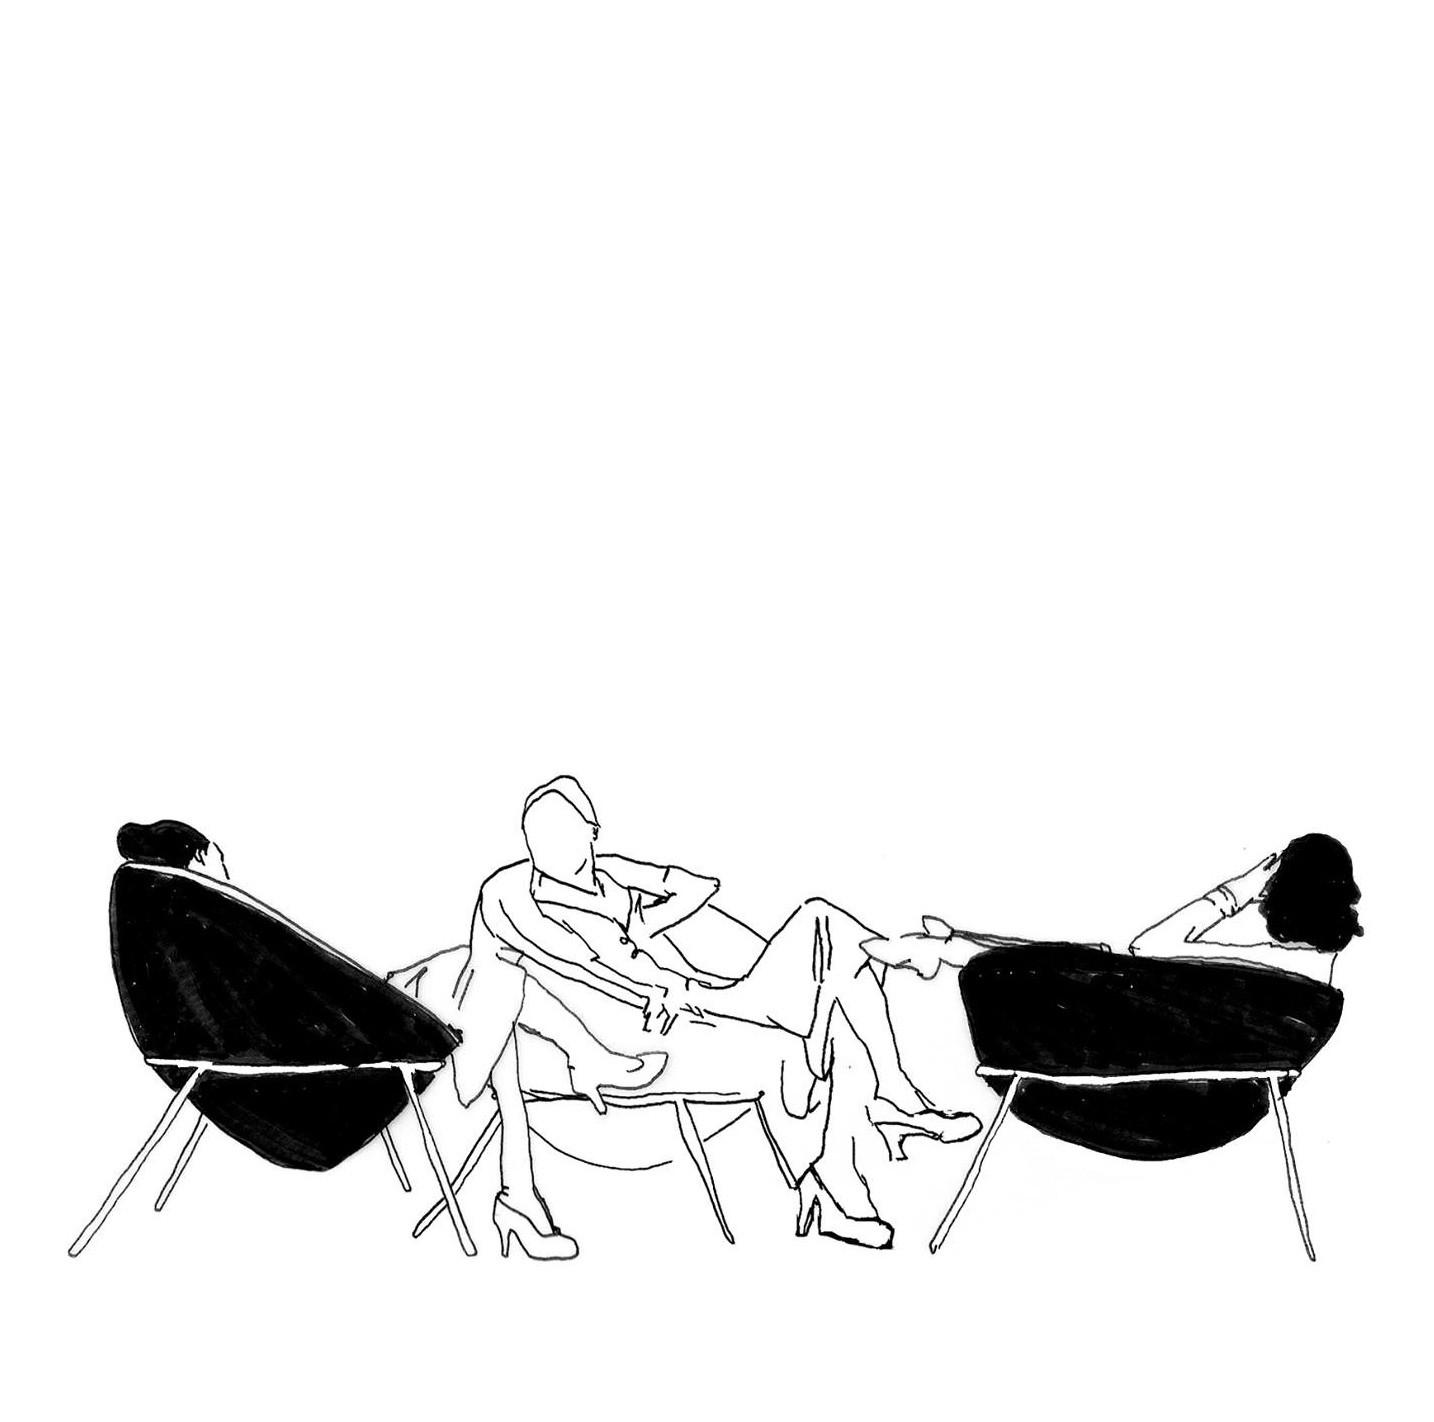 Senta, Lina!, Cortesia de Lígia Zilbersztejn